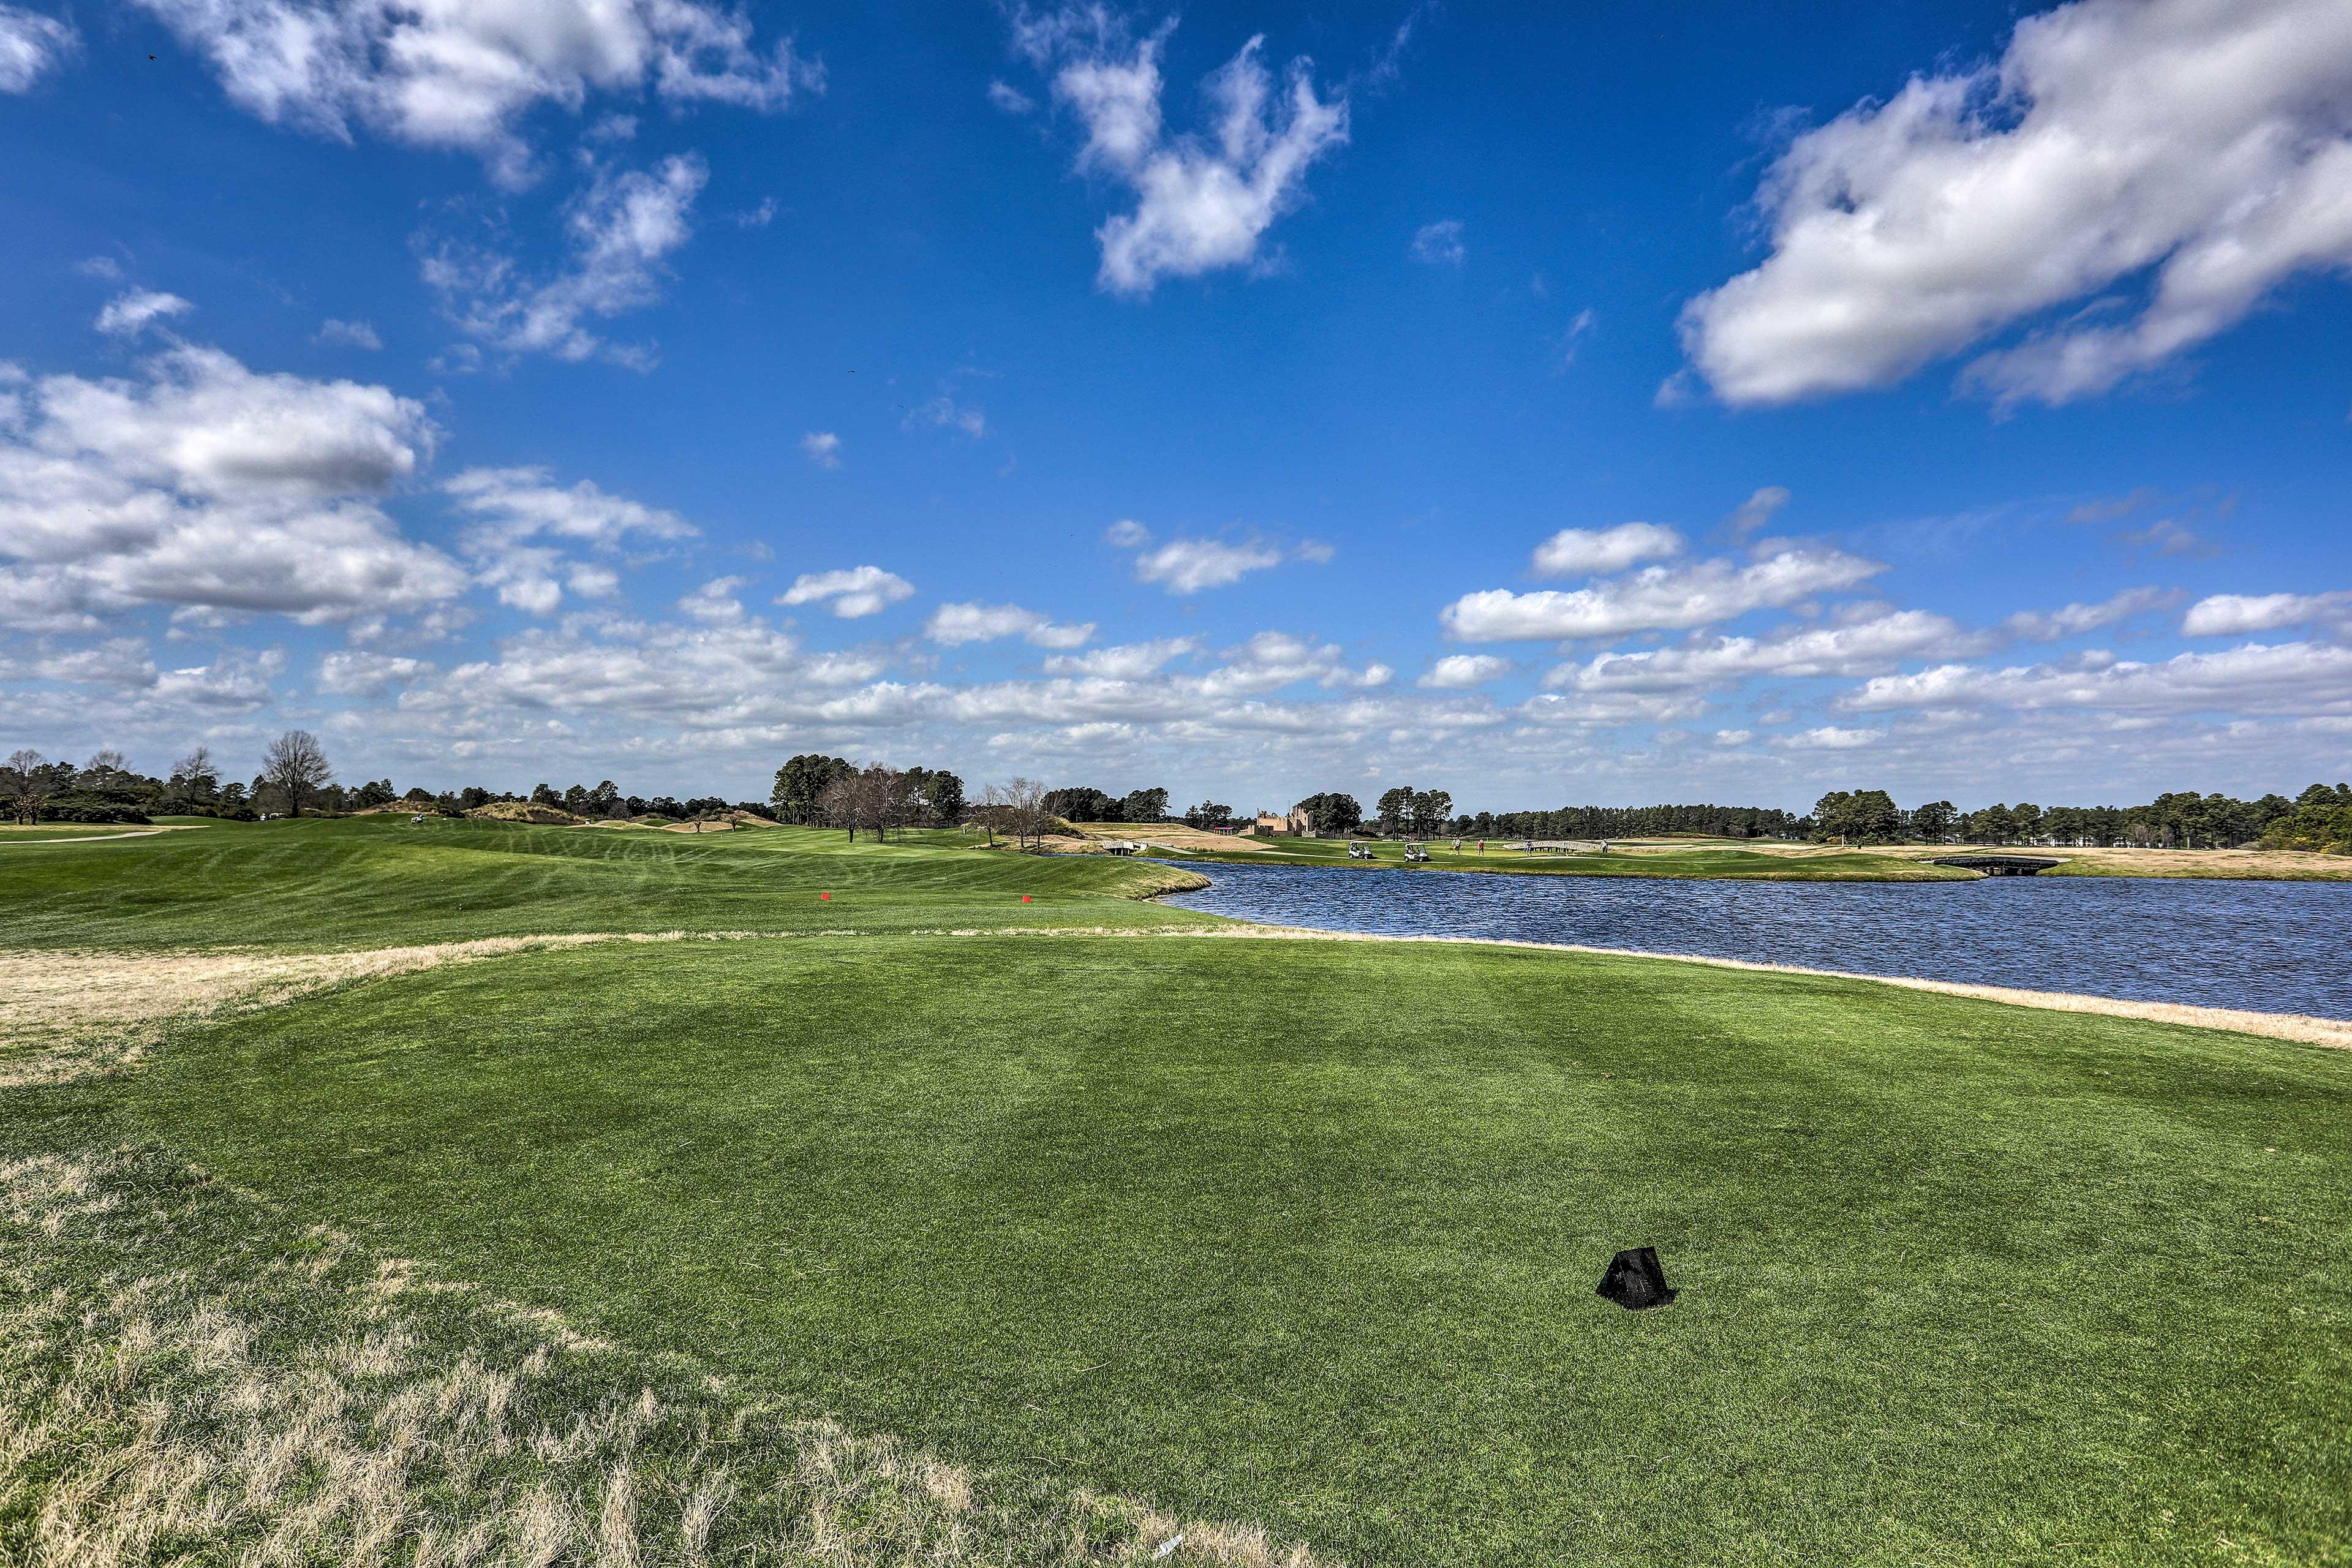 Enjoy days of golf at this vacation rental condo!